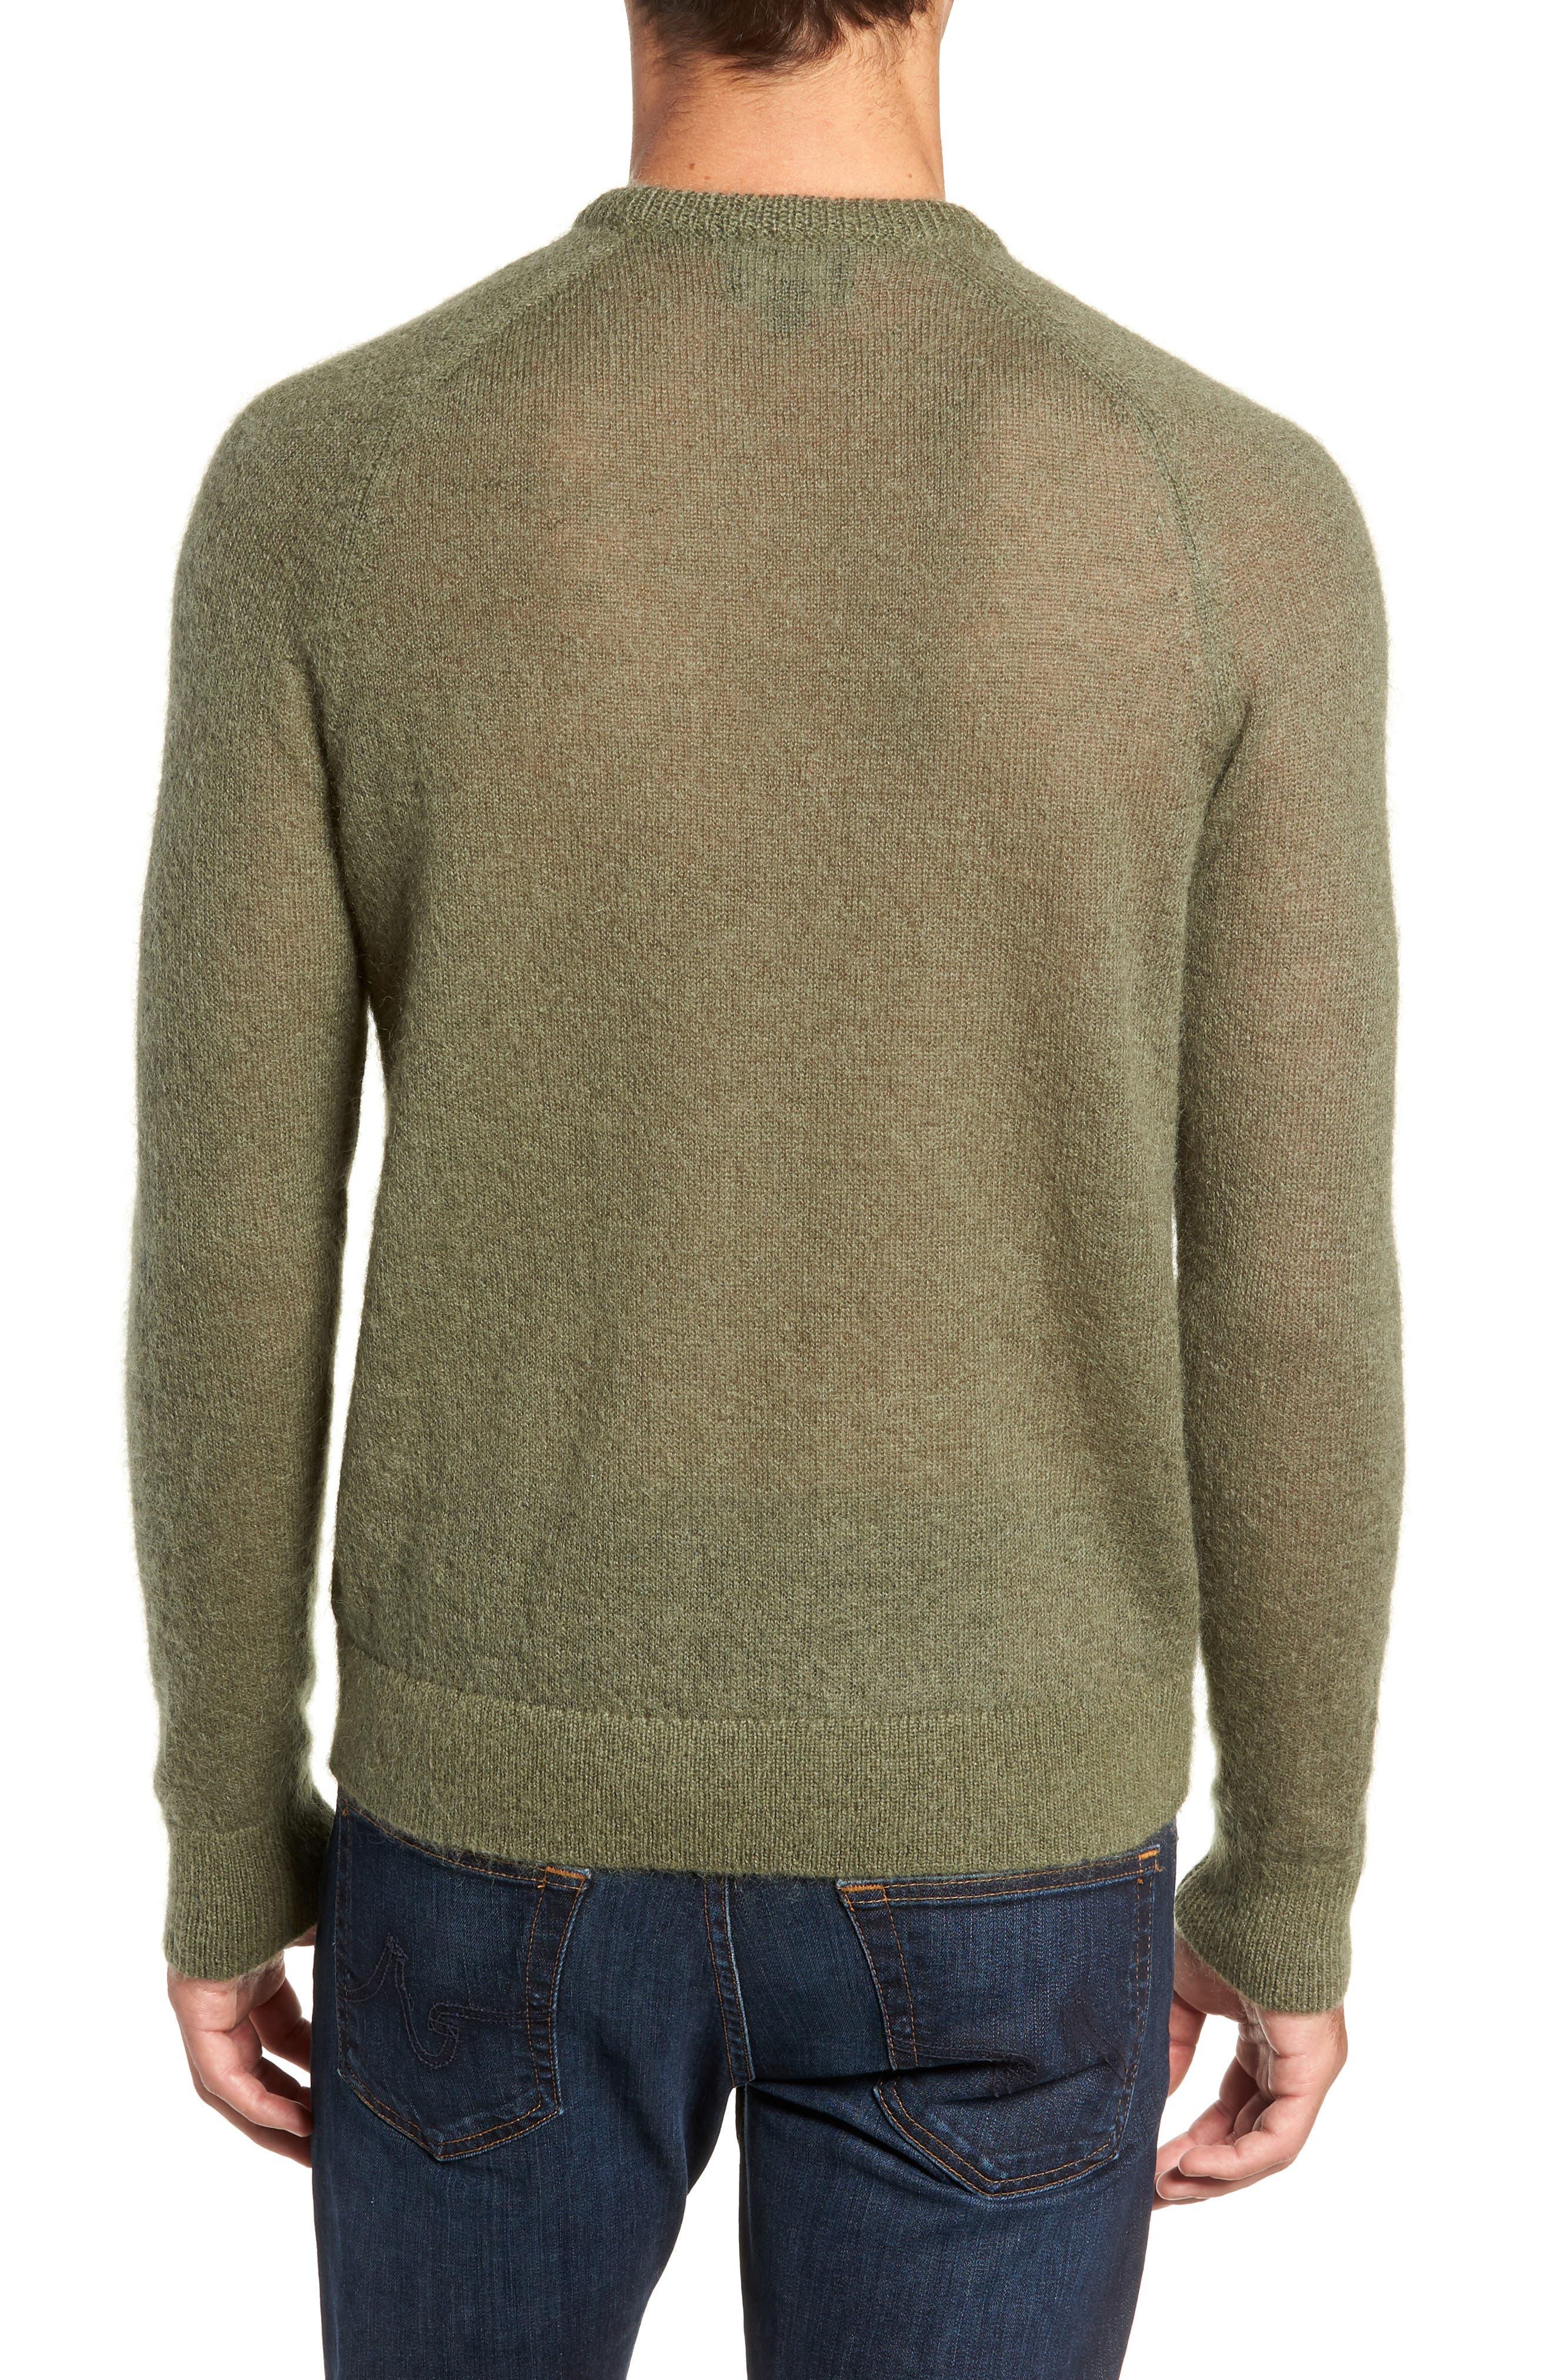 Mohair Blend Crewneck Sweater,                             Alternate thumbnail 2, color,                             340